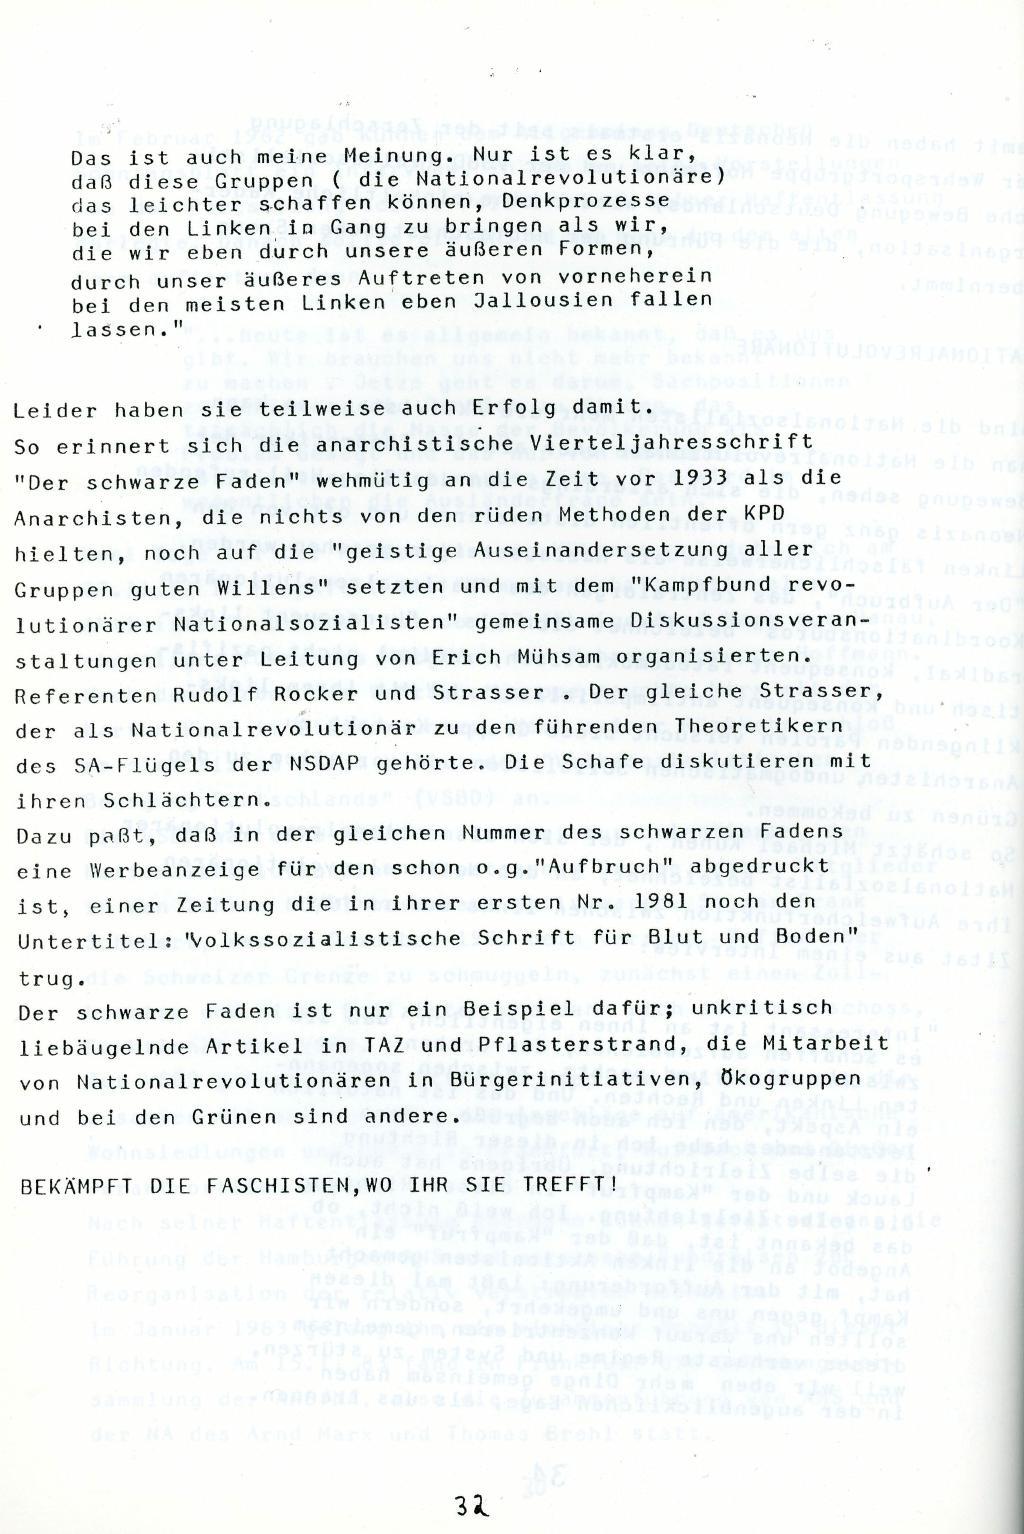 Berlin_1983_Autonome_Gruppen_Faschismus_im_Kapitalismus_32